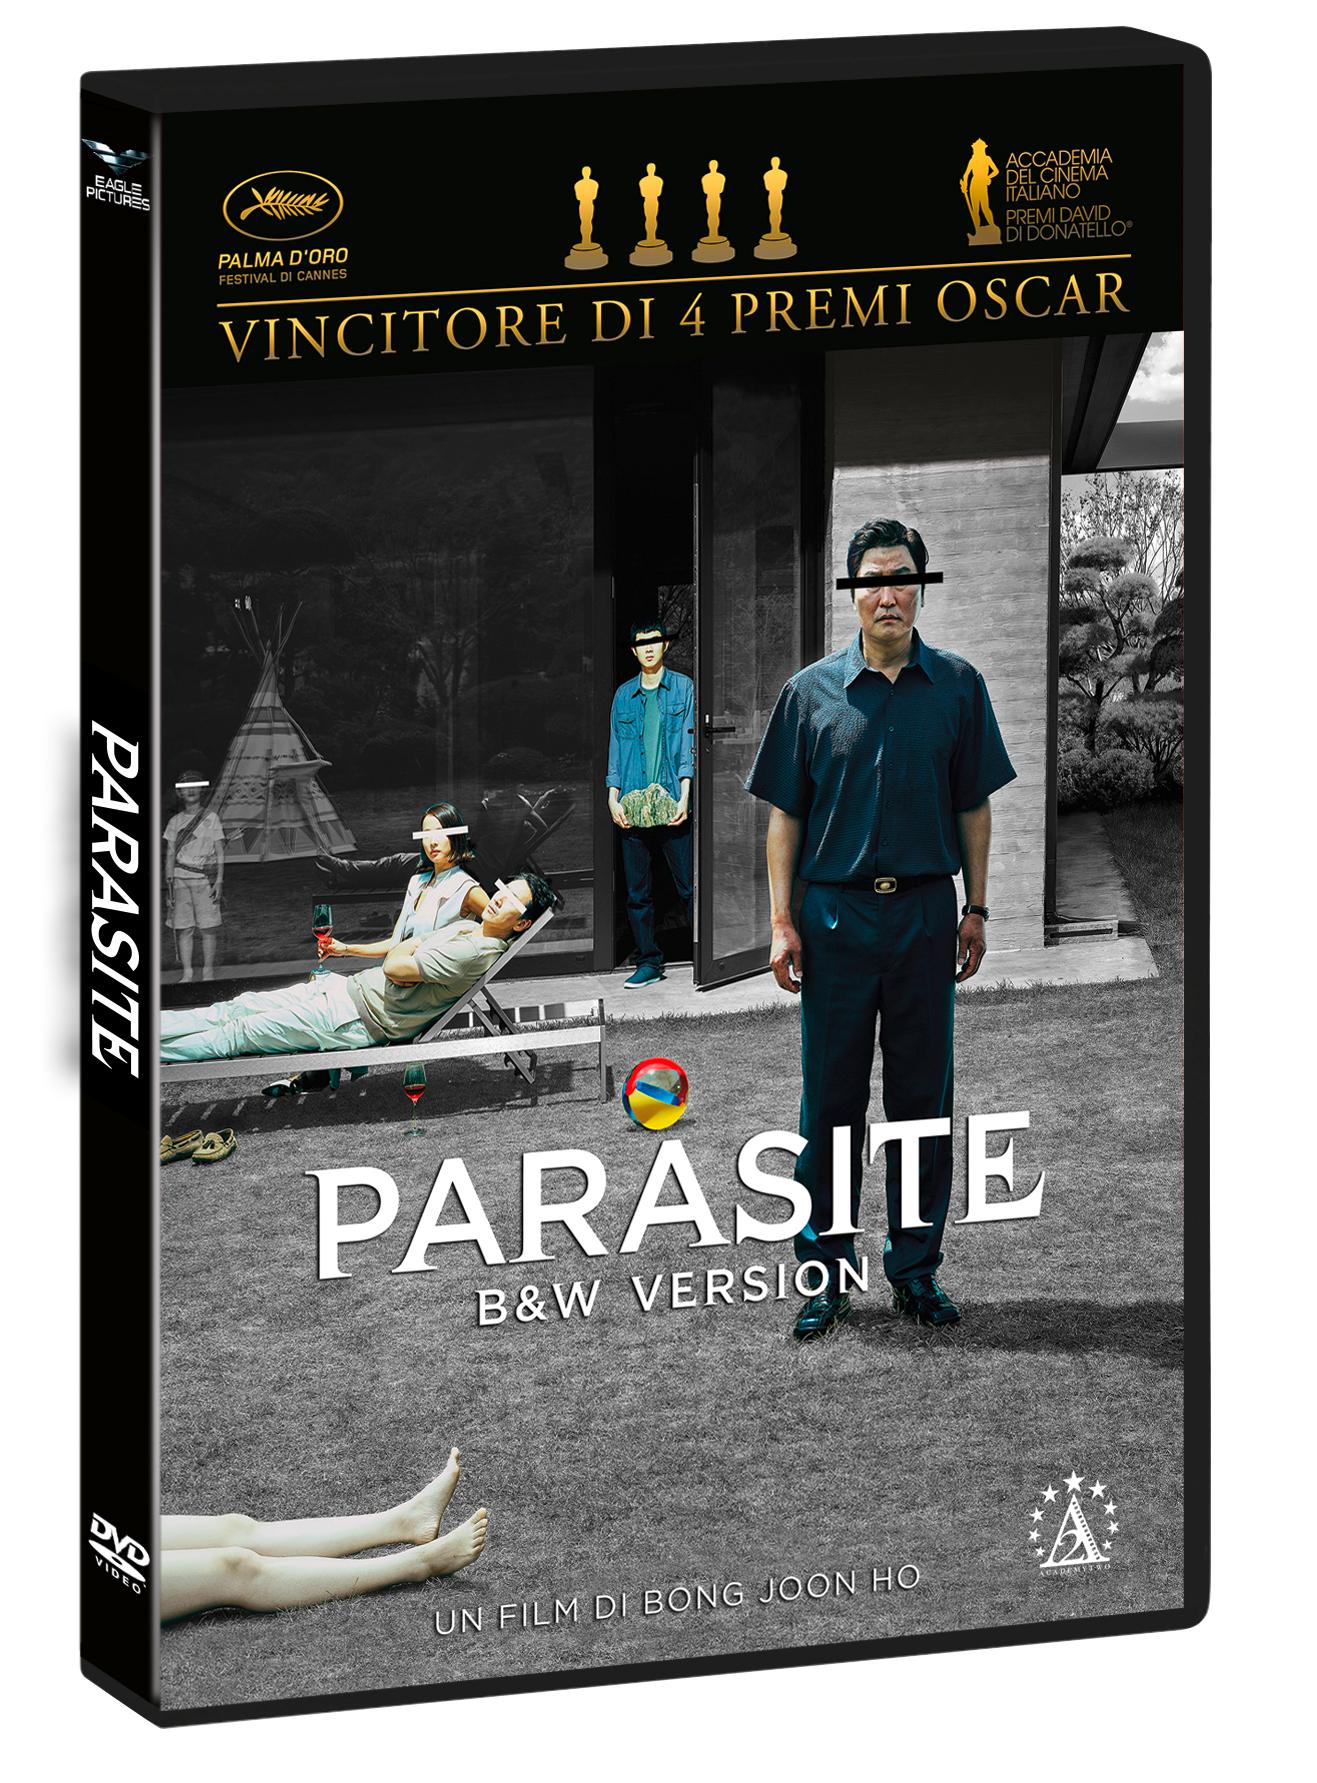 PARASITE (B&W VERSION) (DVD)